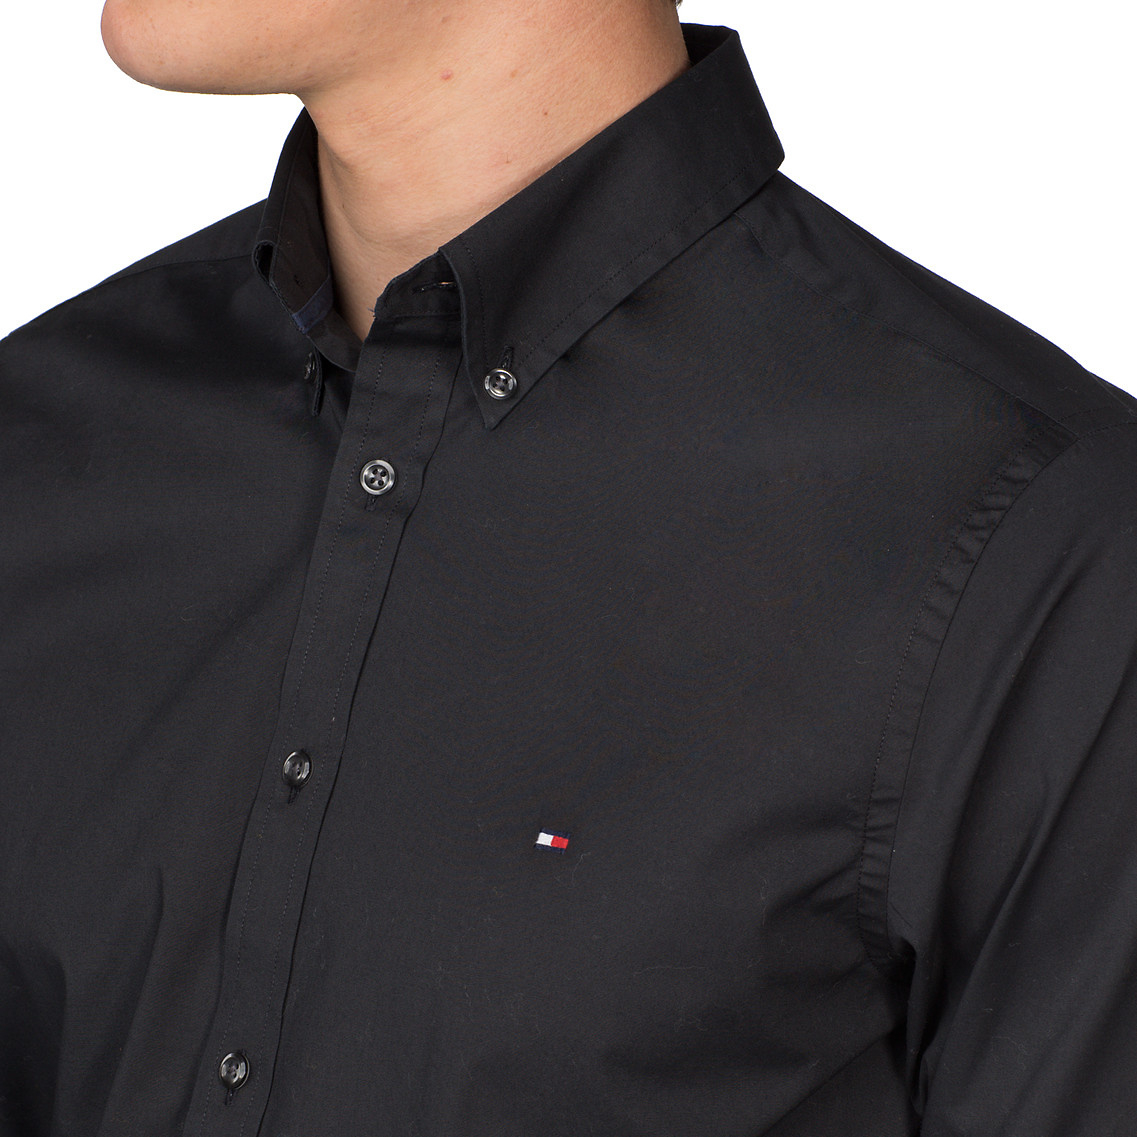 e8611c11d Tommy Hilfiger Stretch Poplin Slim Fit Shirt in Black for Men - Lyst